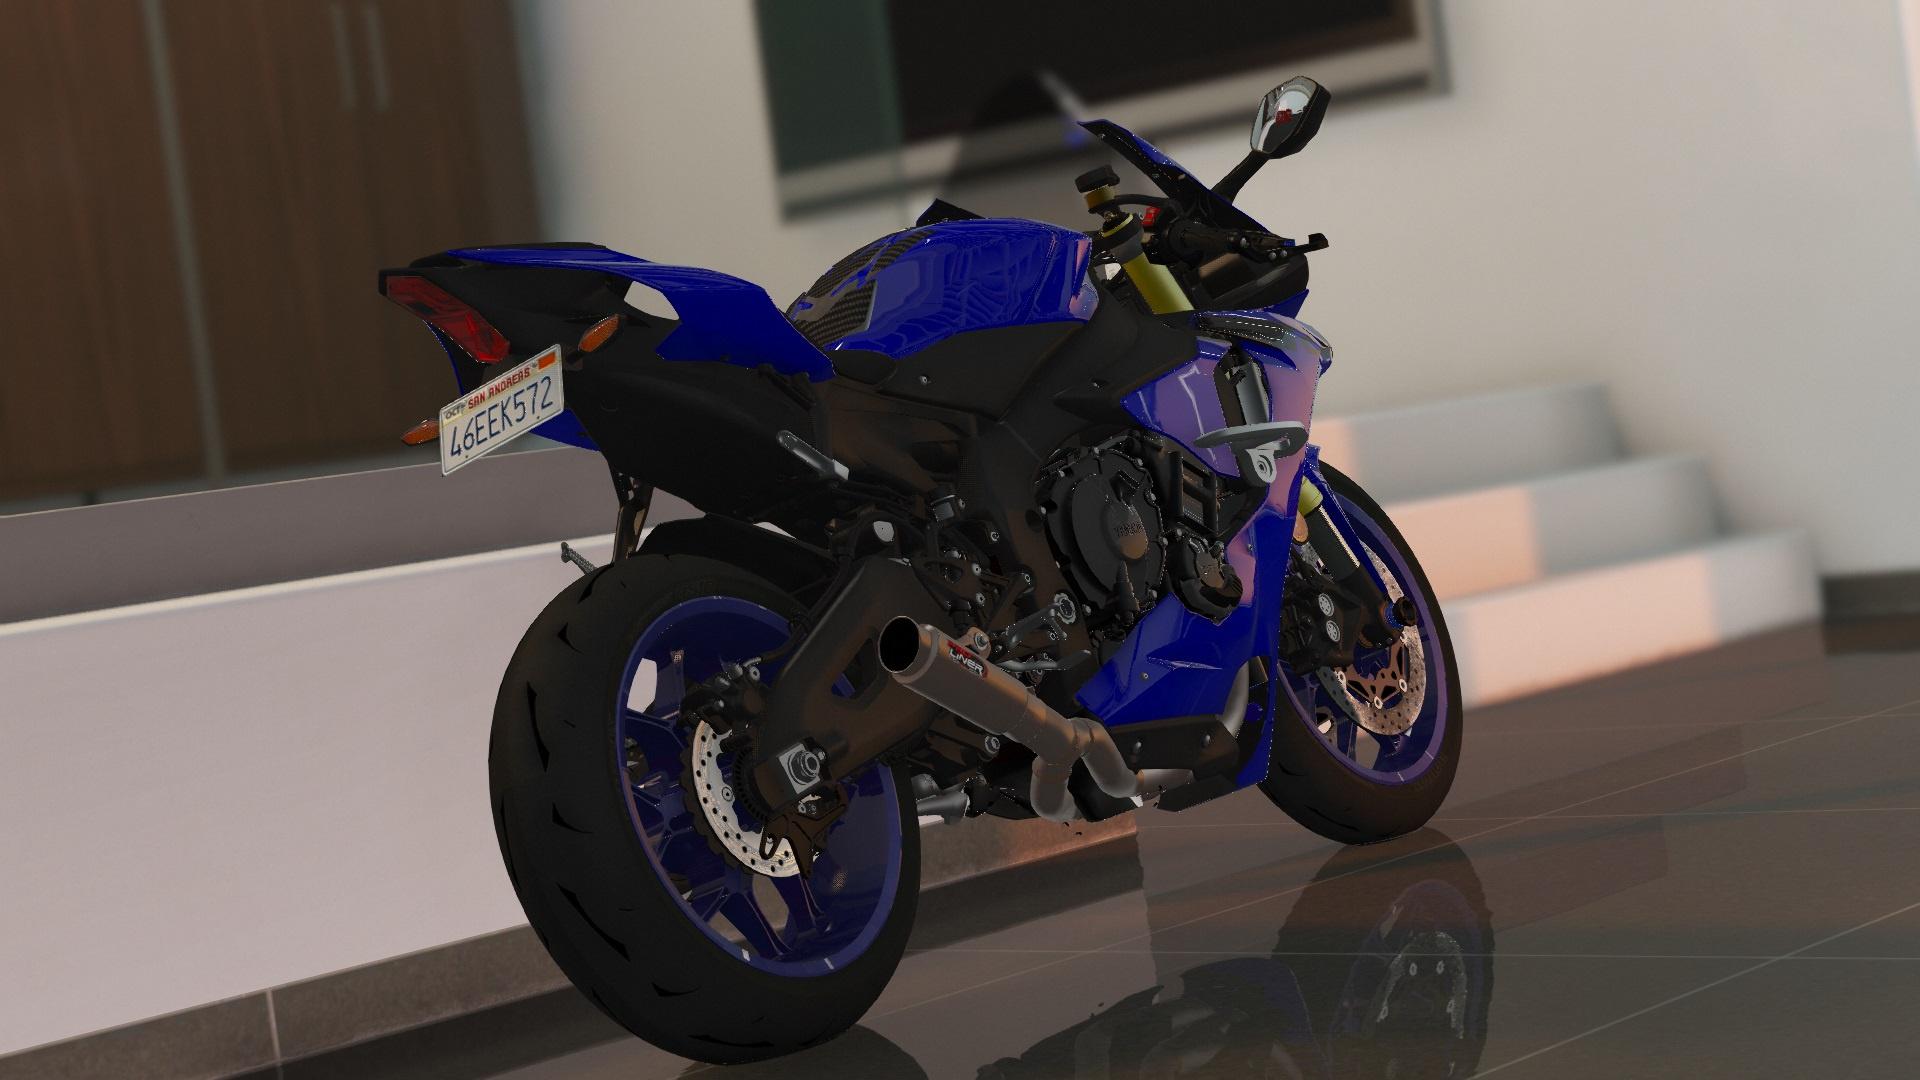 2018 Yamaha Yzf R1 R1m Addons Tuning Gta5 Mods Com